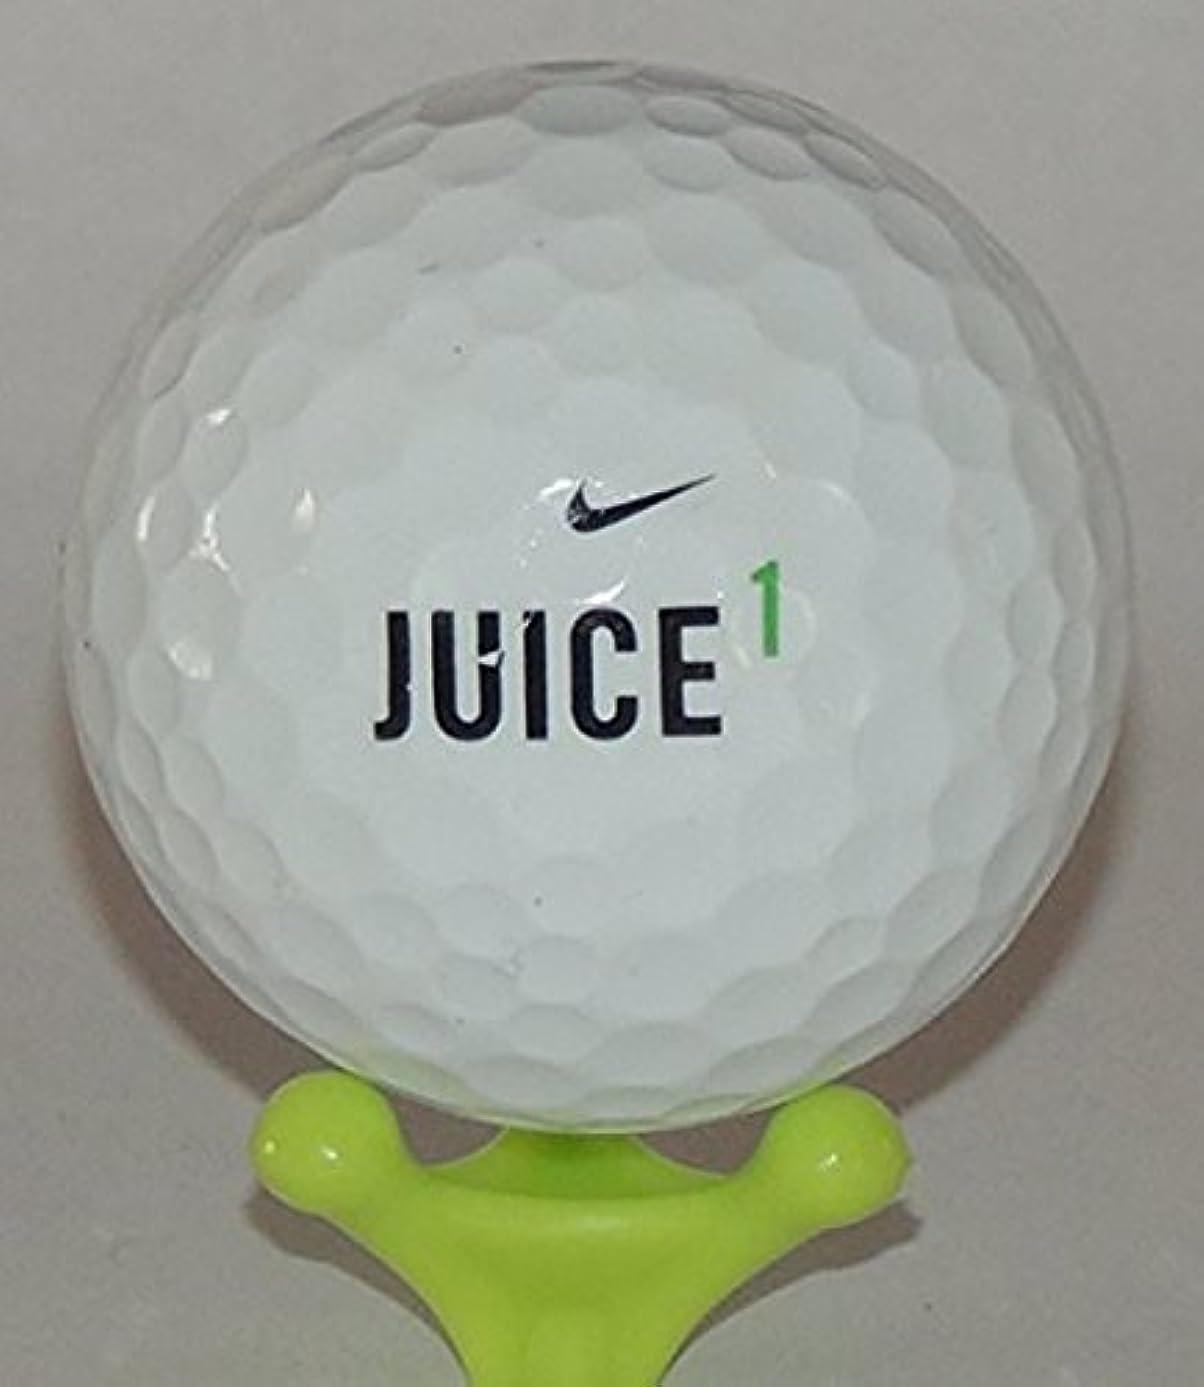 60 Mint Nike Juice Used Golf Balls [Misc.]